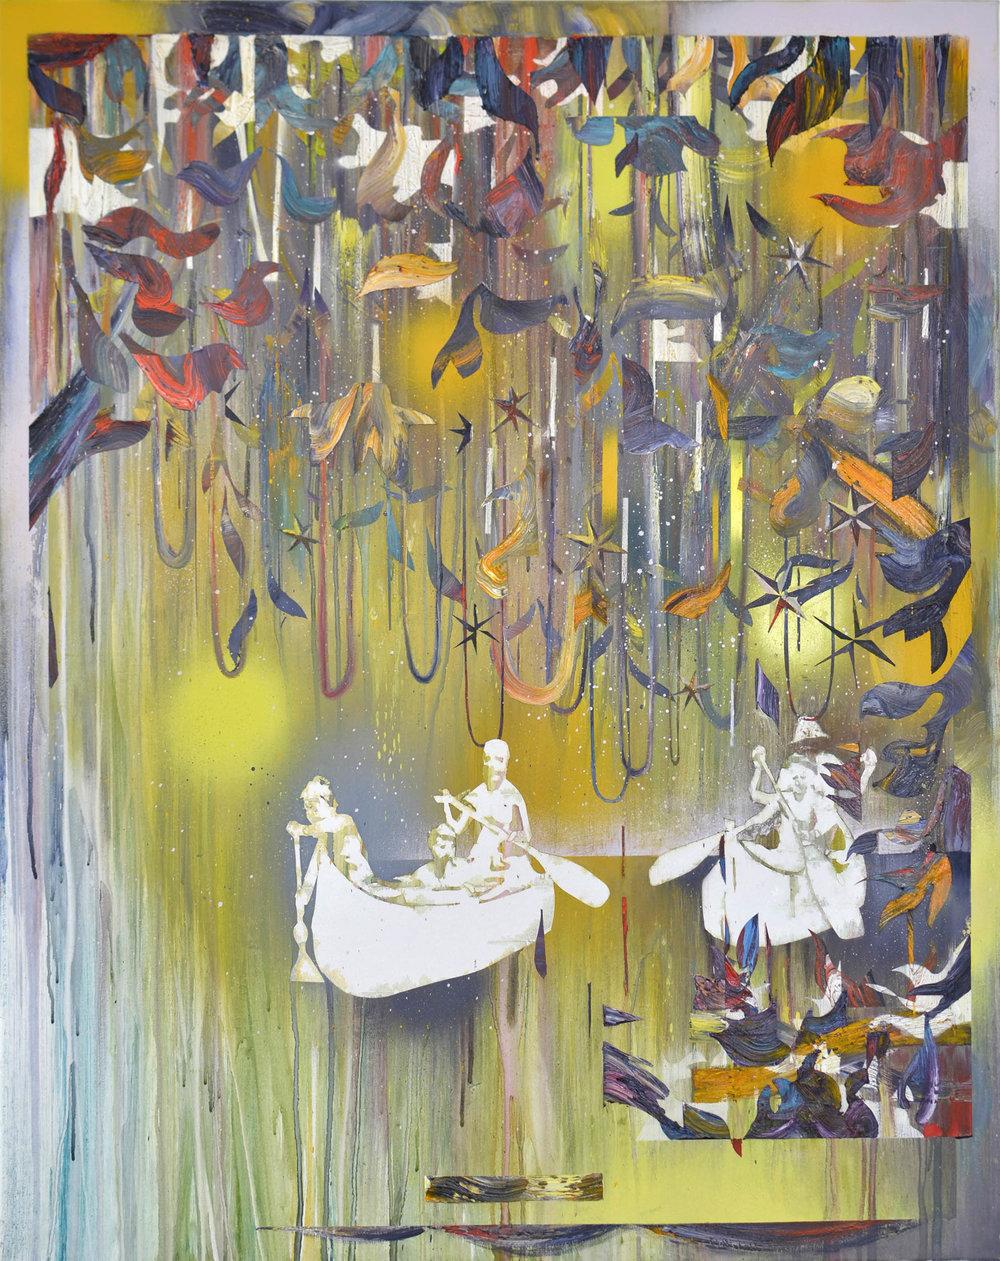 Sonntags im Schilf  oil on canvas 120 x 95 cm, 2017